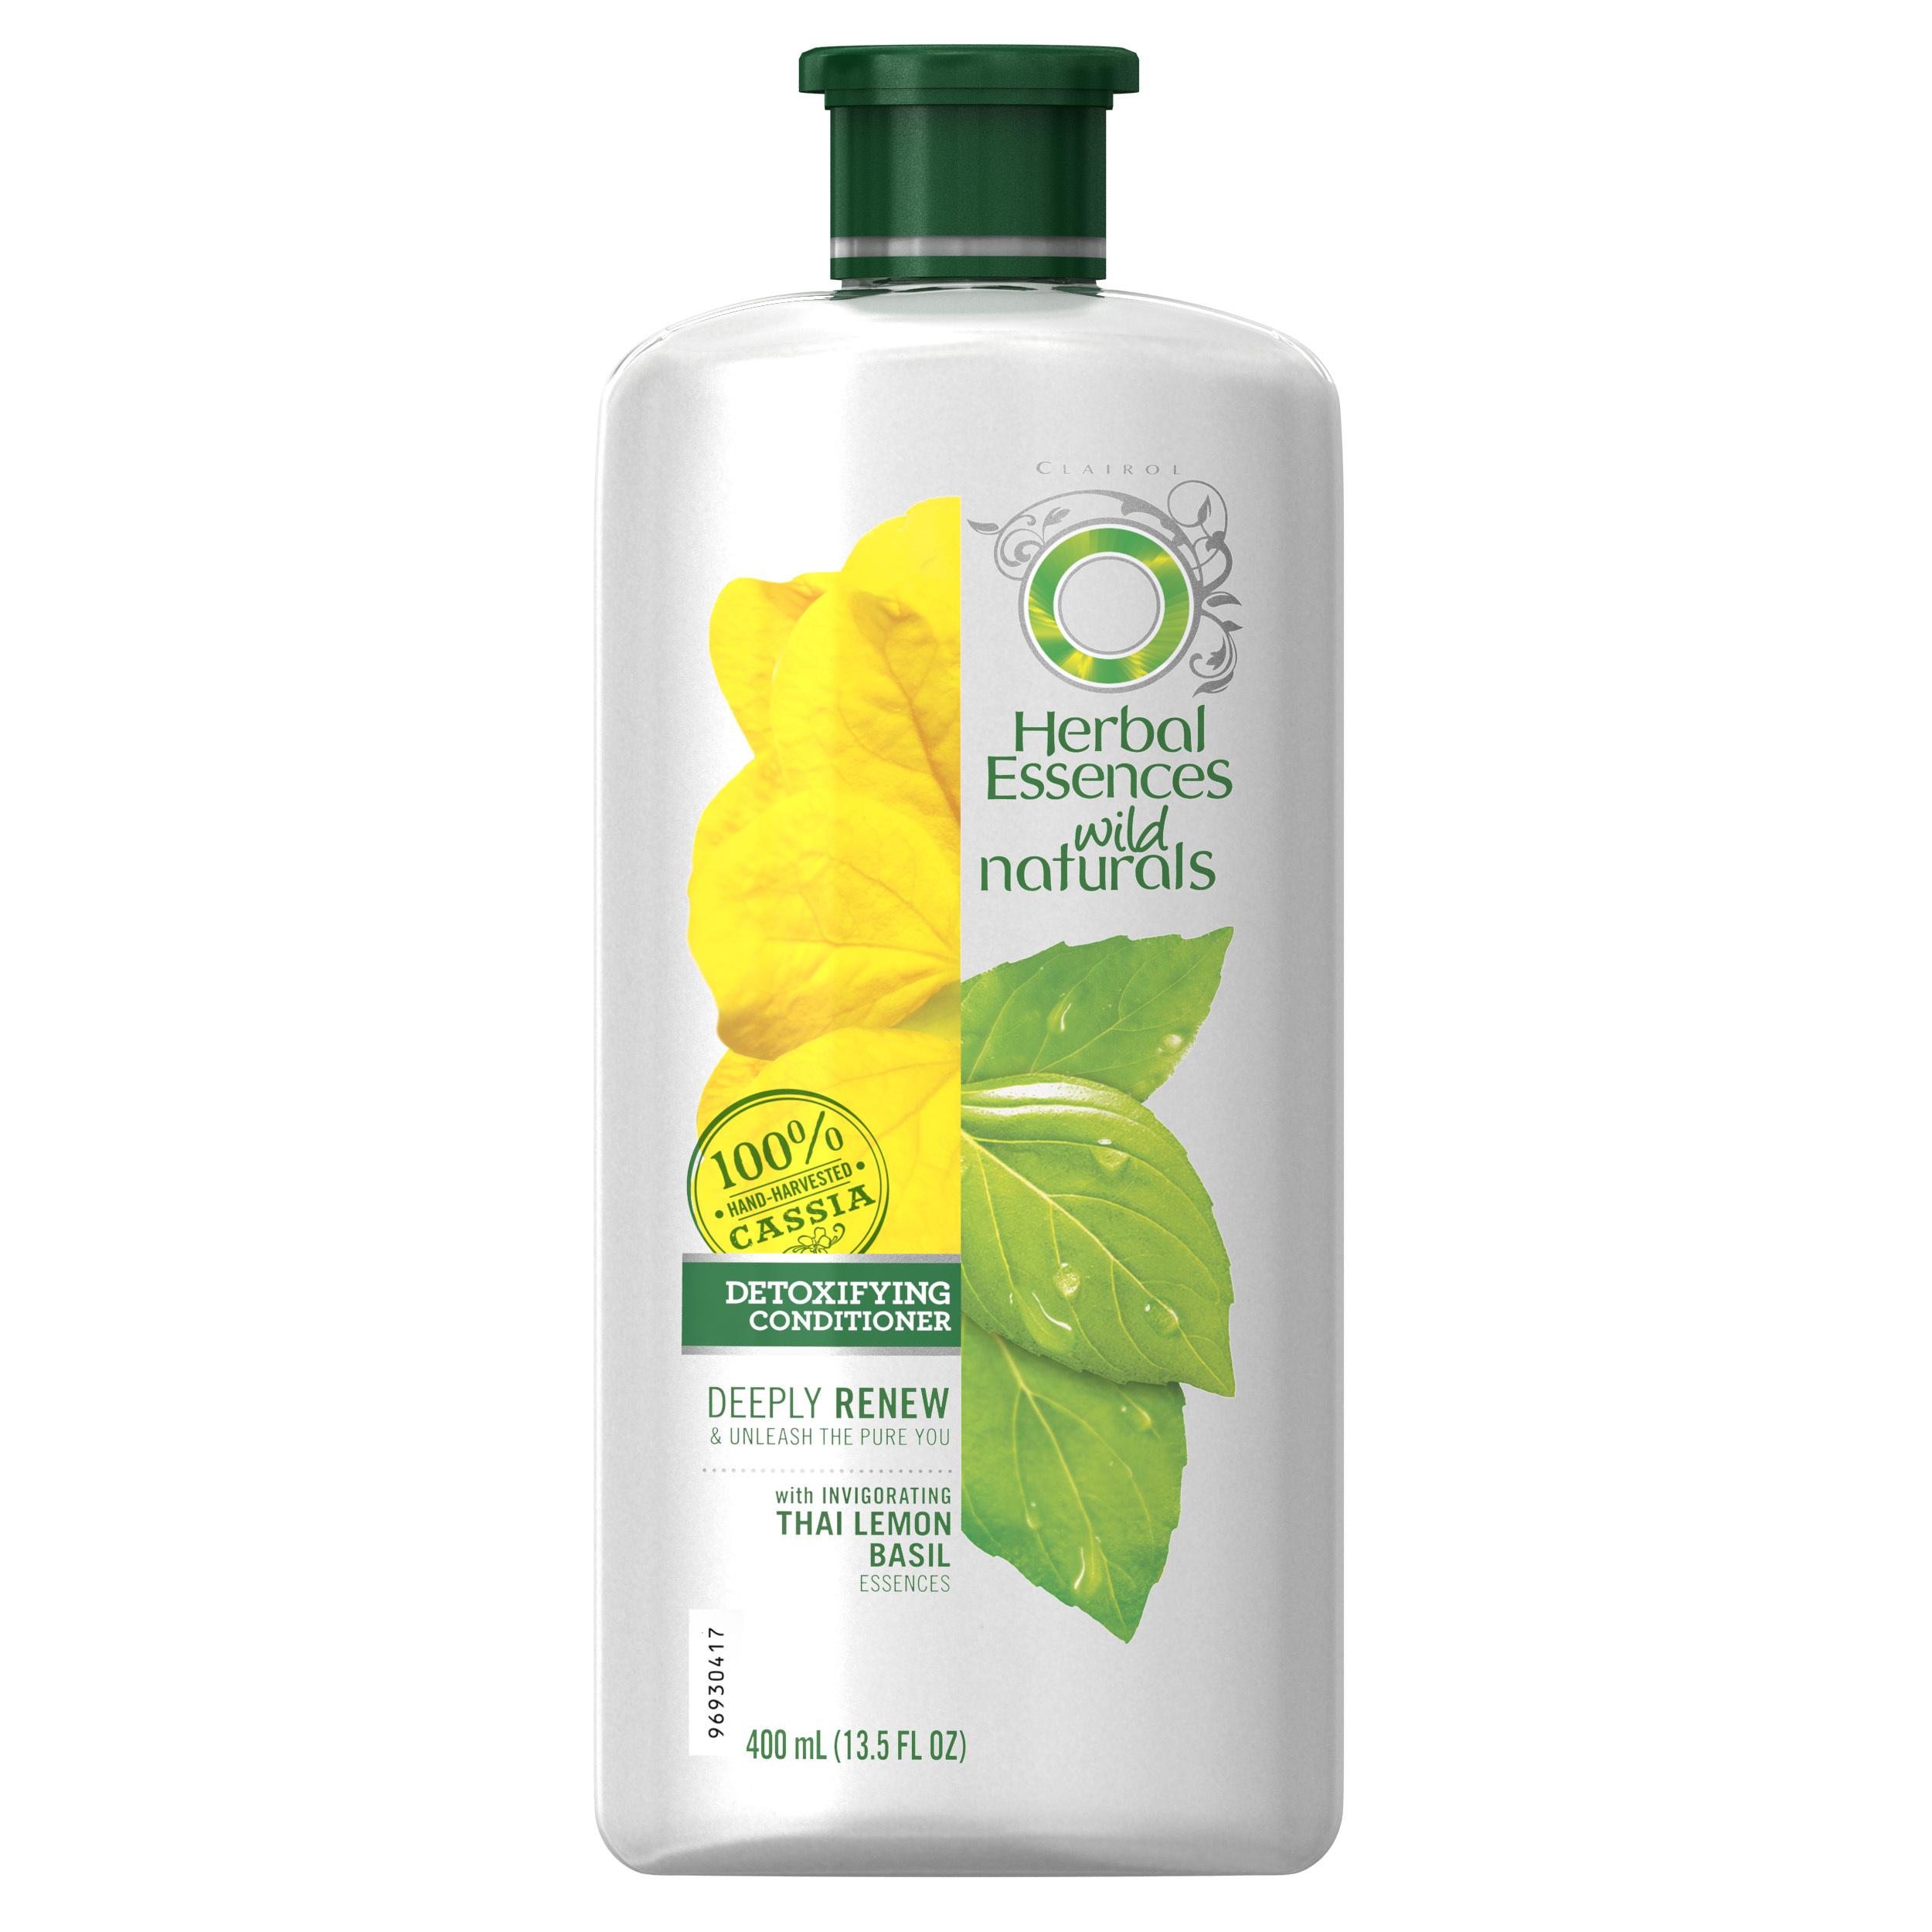 Herbal Essences Wild Naturals Detoxifying Conditioner, 13.5 fl oz